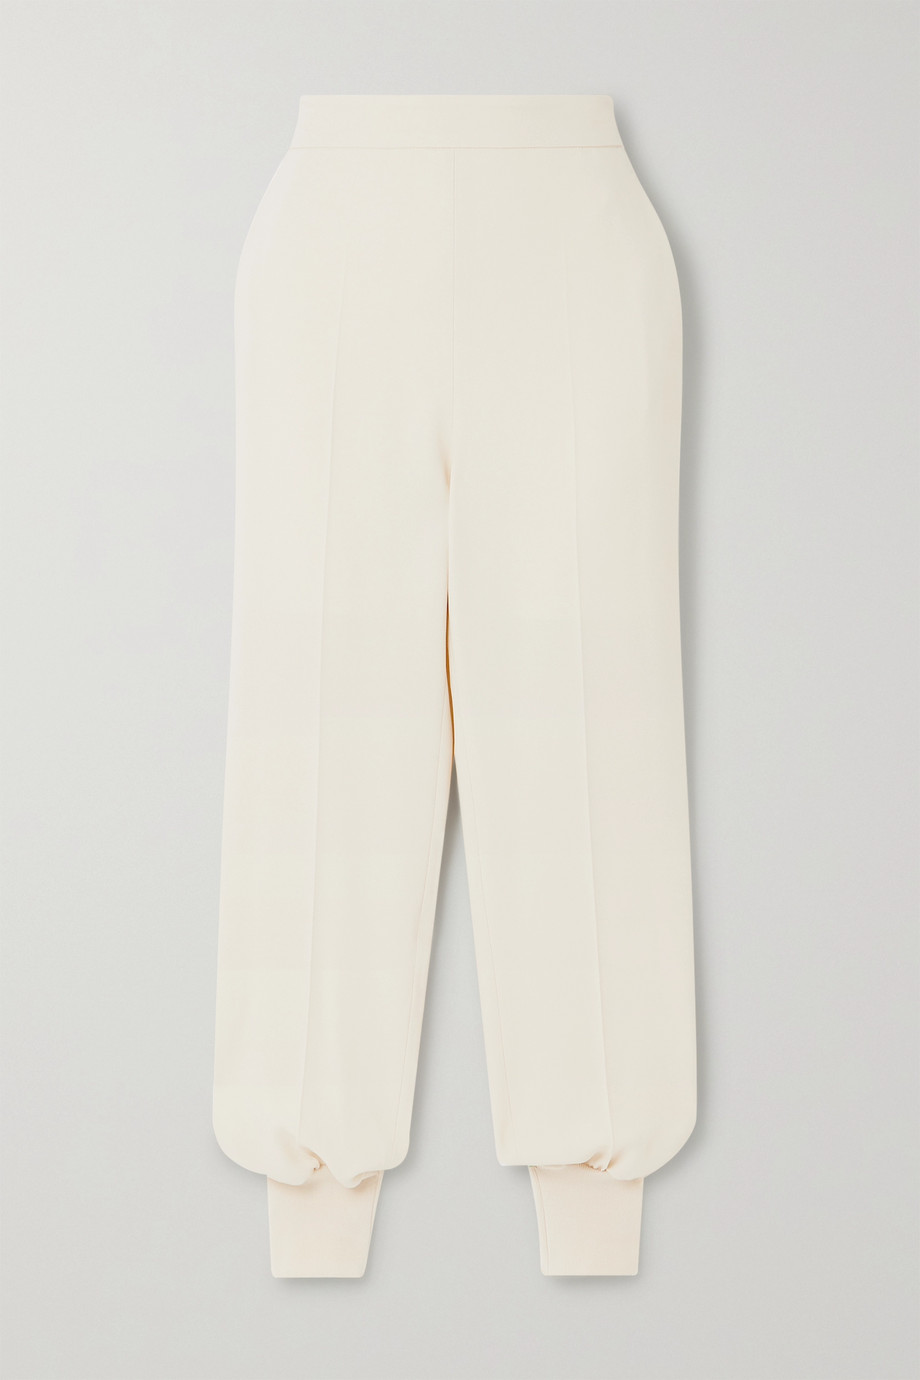 Stella McCartney + NET SUSTAIN stretch-cady track pants